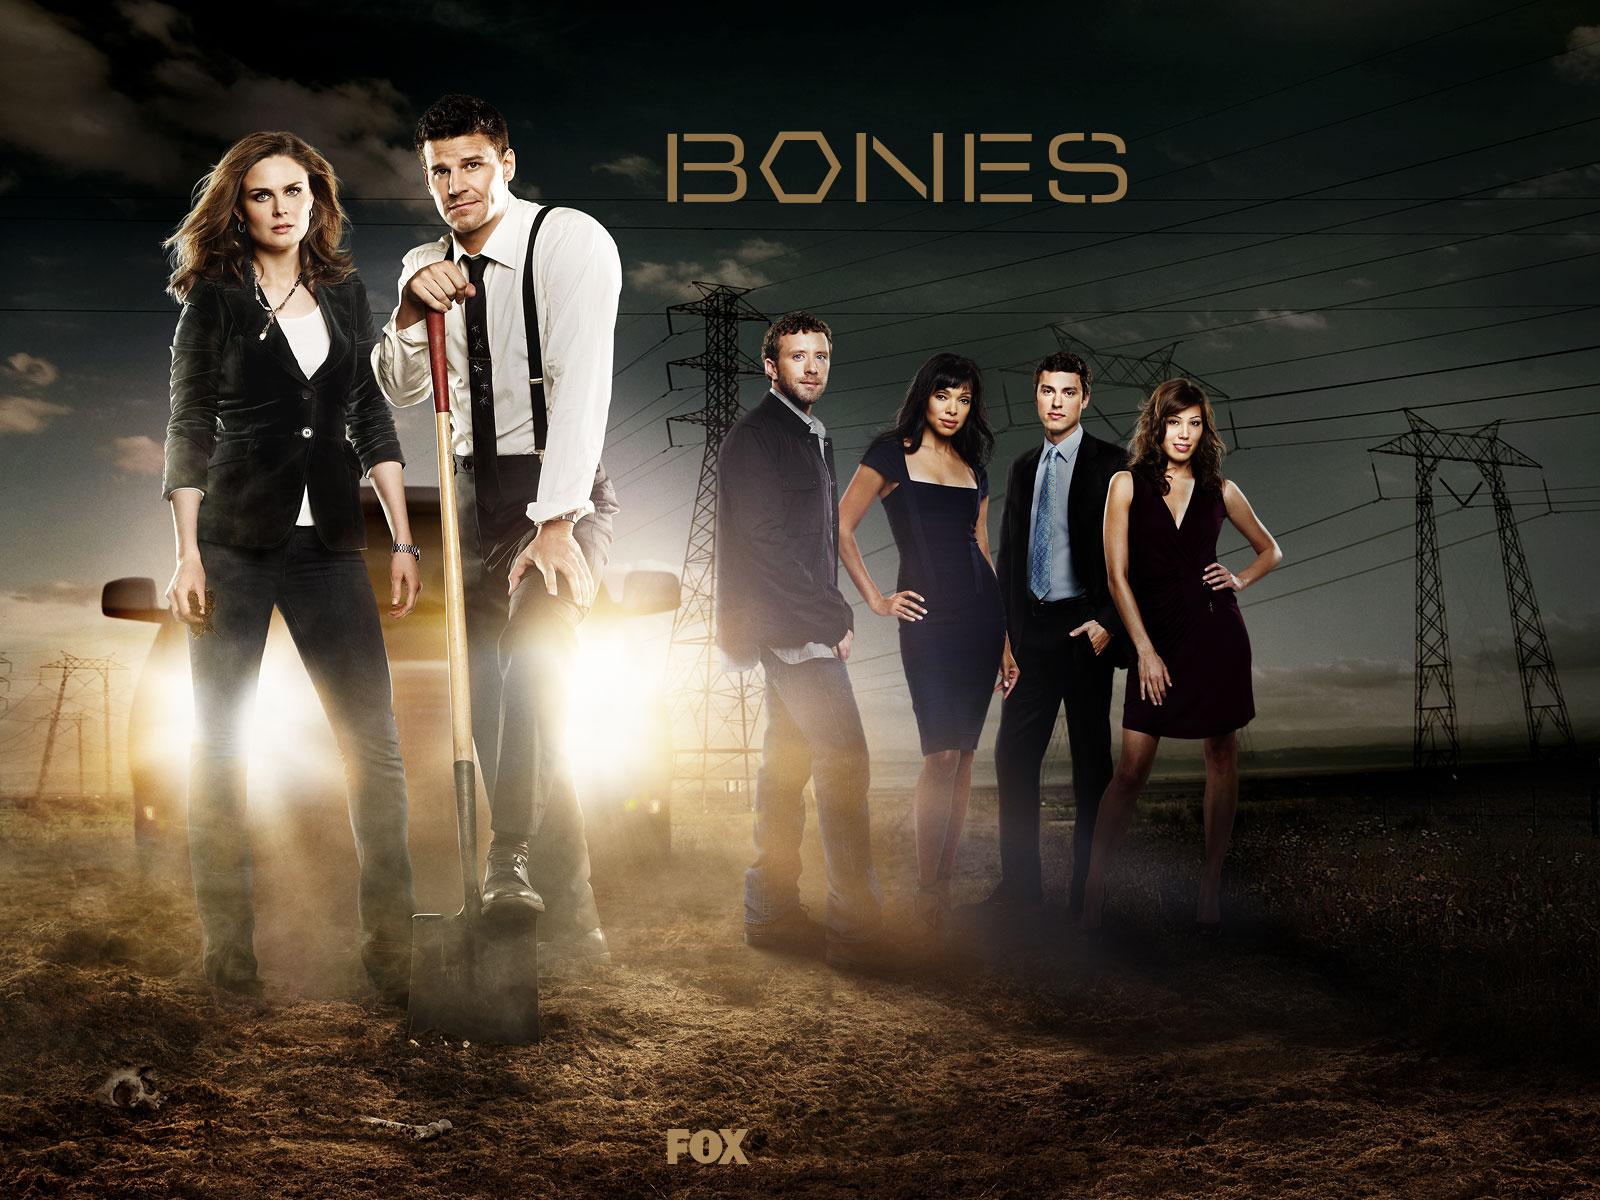 fringe bones episode guide spoilersThe SpoilerTV Favourite TV Series Competition 2013   Day 21 RR6dspLF